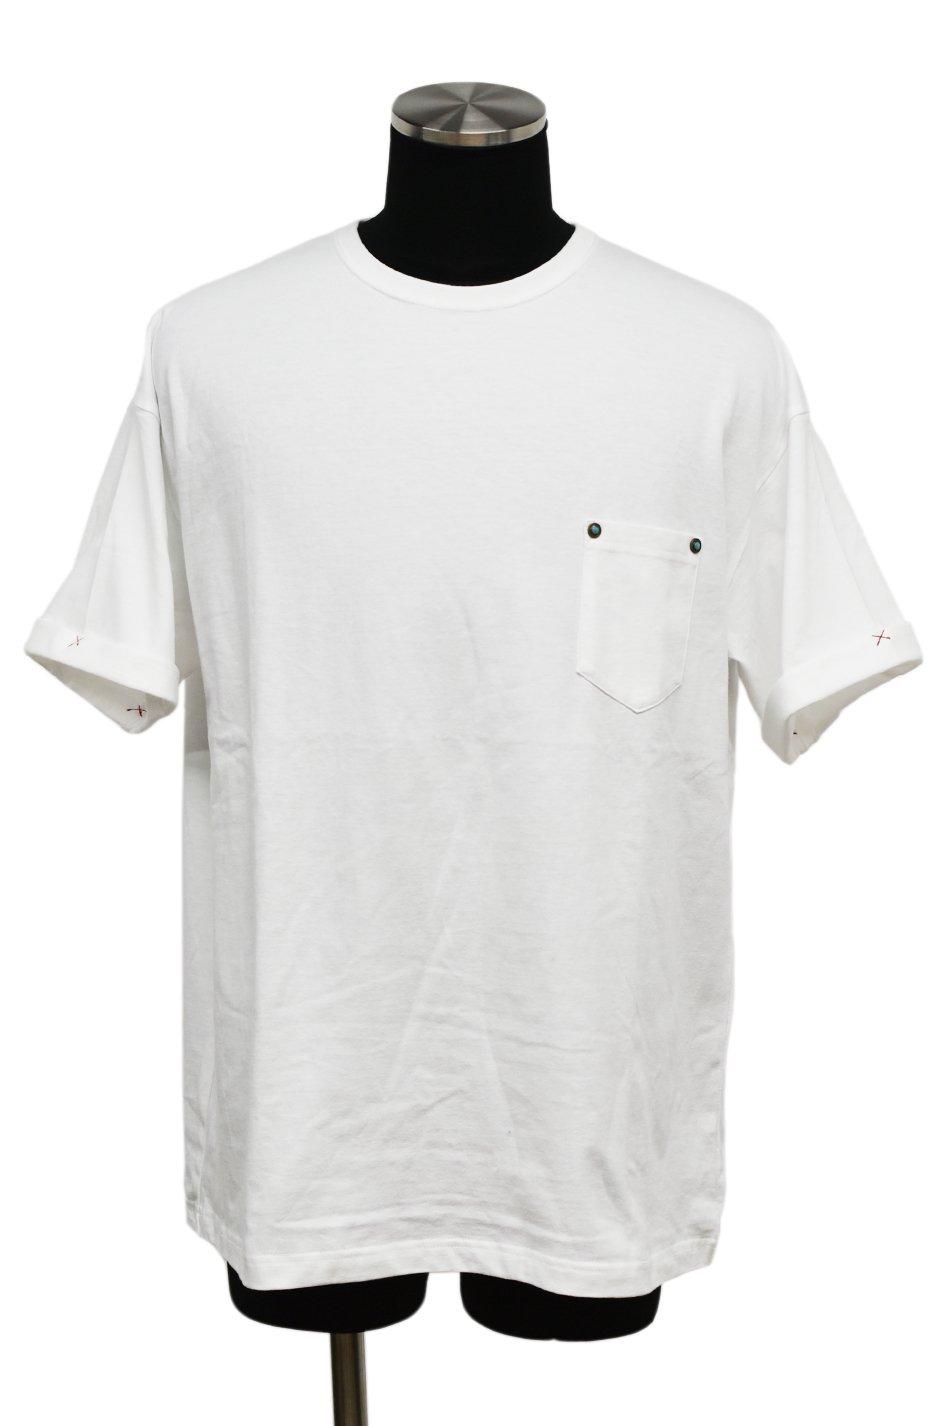 40%off! 【T-Shirt FES】BURNOUT(バーンアウト)ポケット付きビッグTシャツ / ホワイト